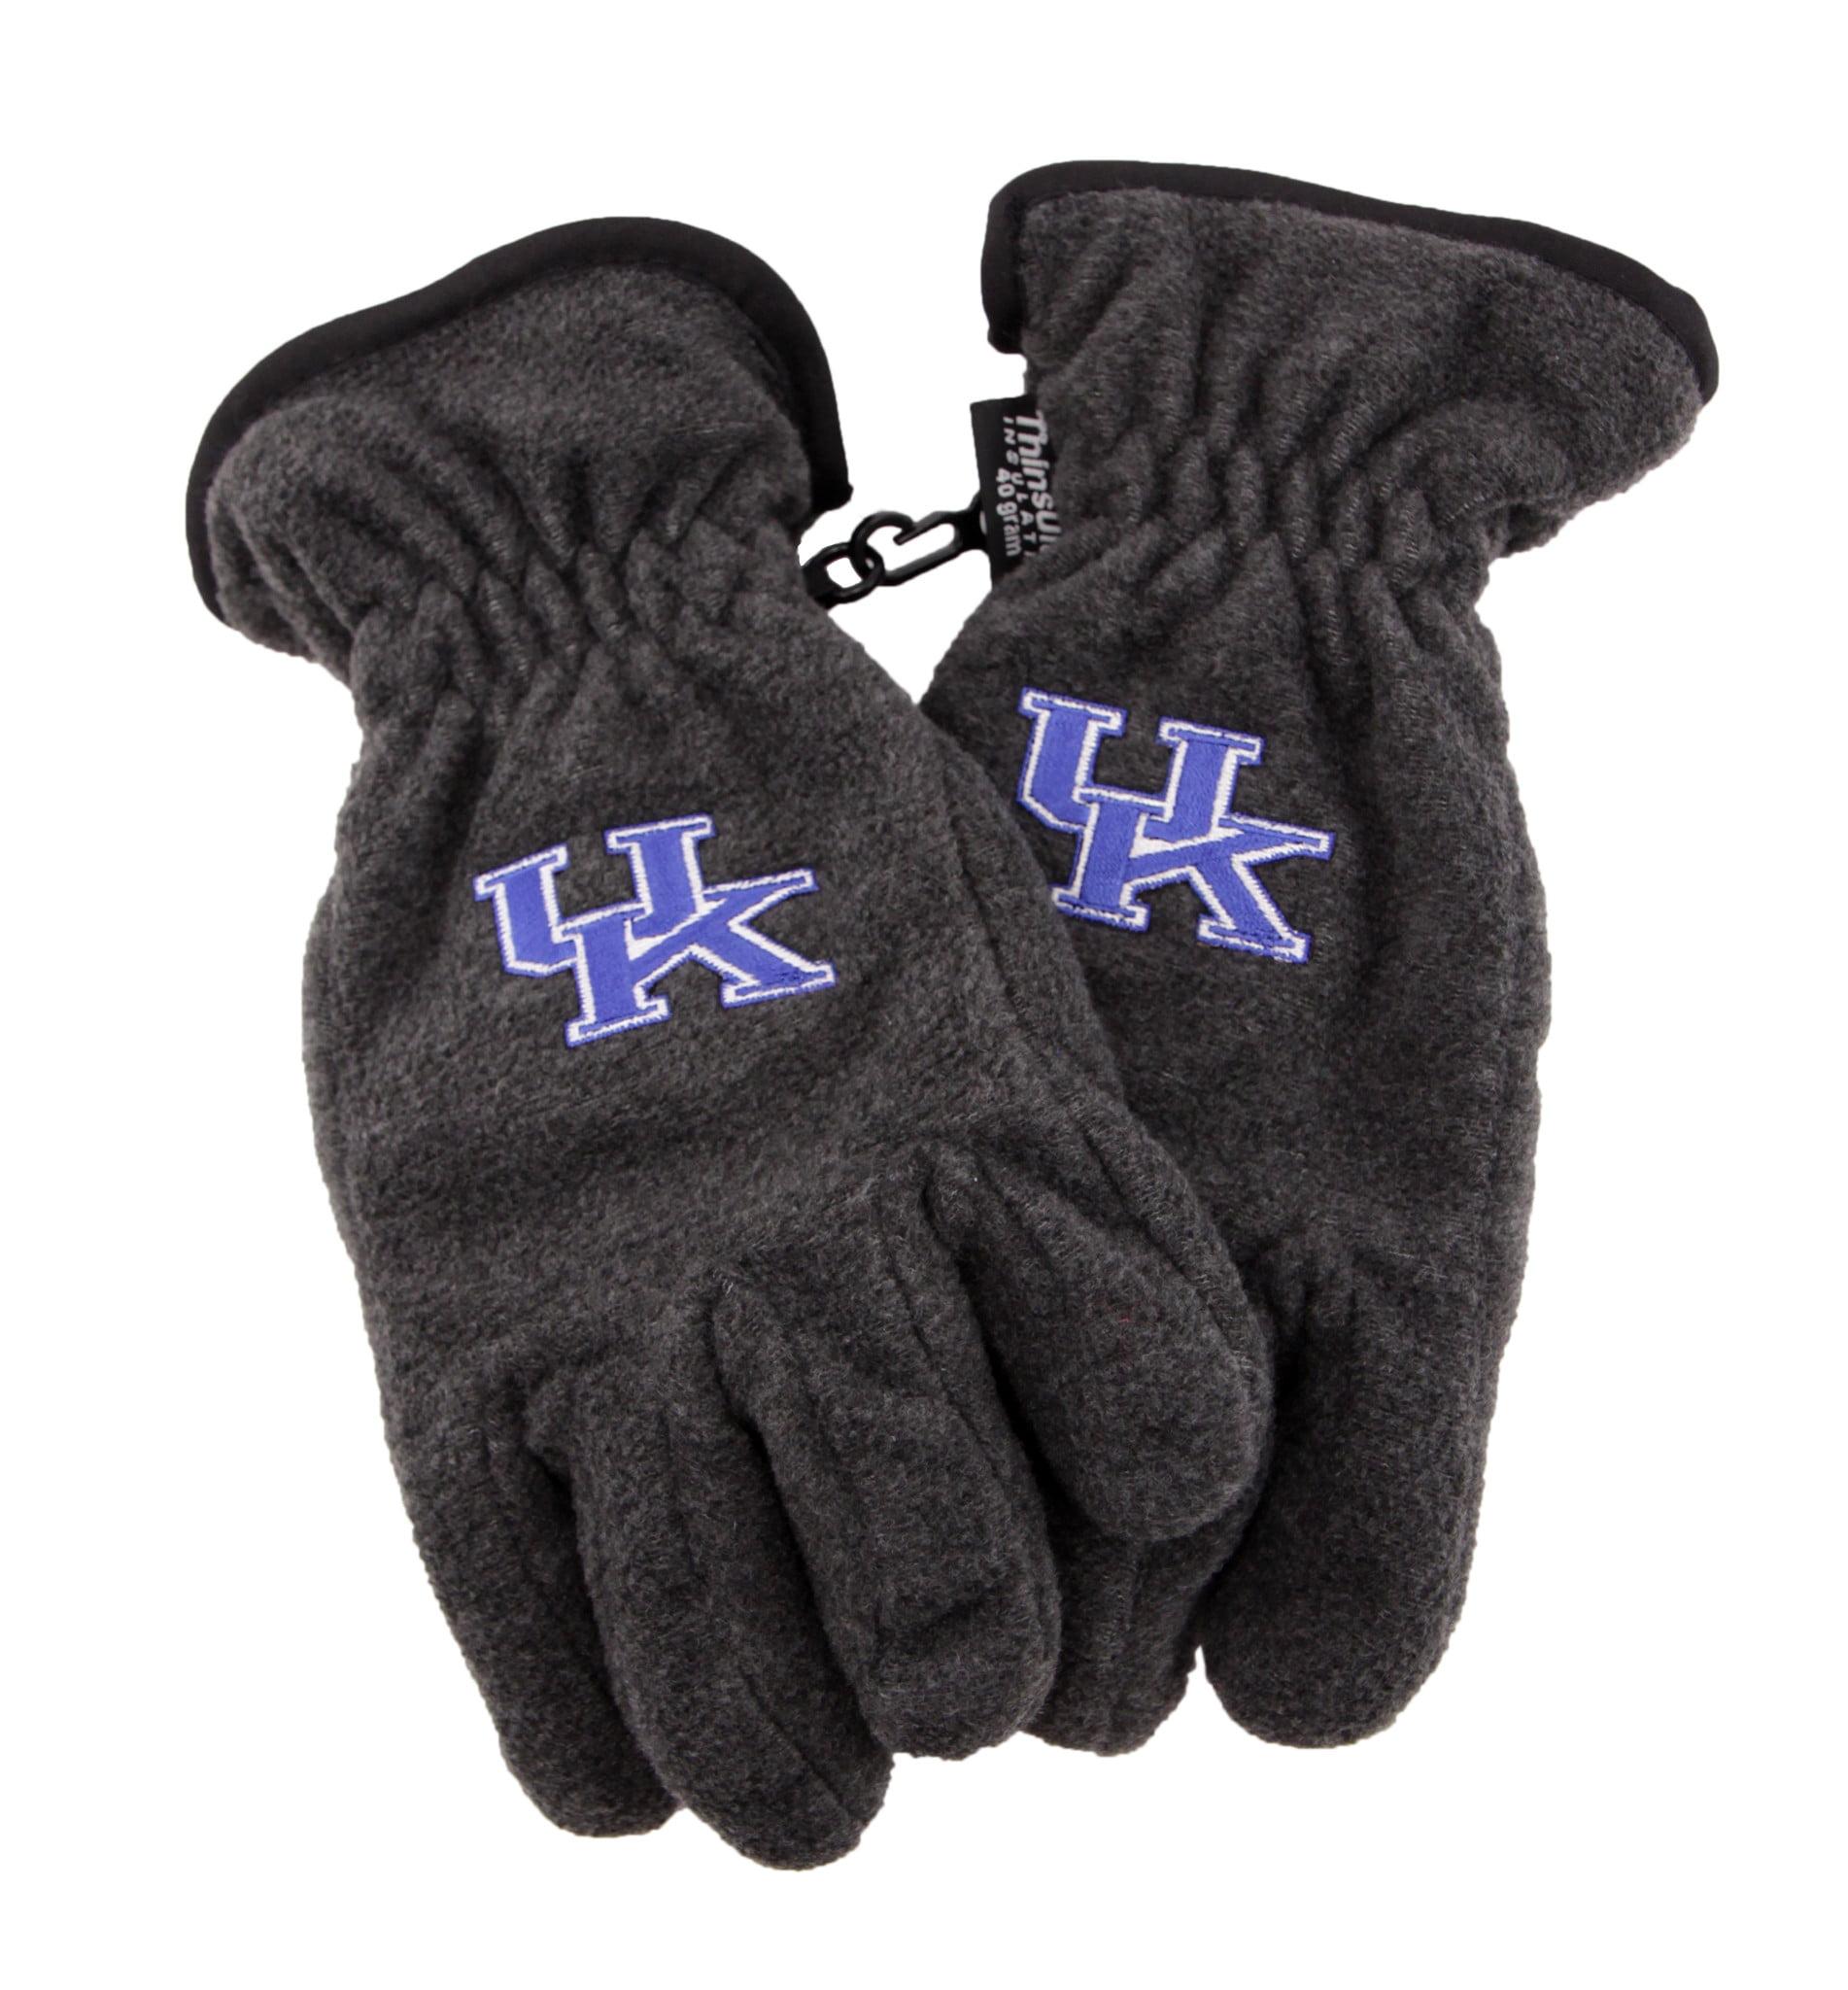 University of Kentucky Heavy-Weight Fleece Gloves by